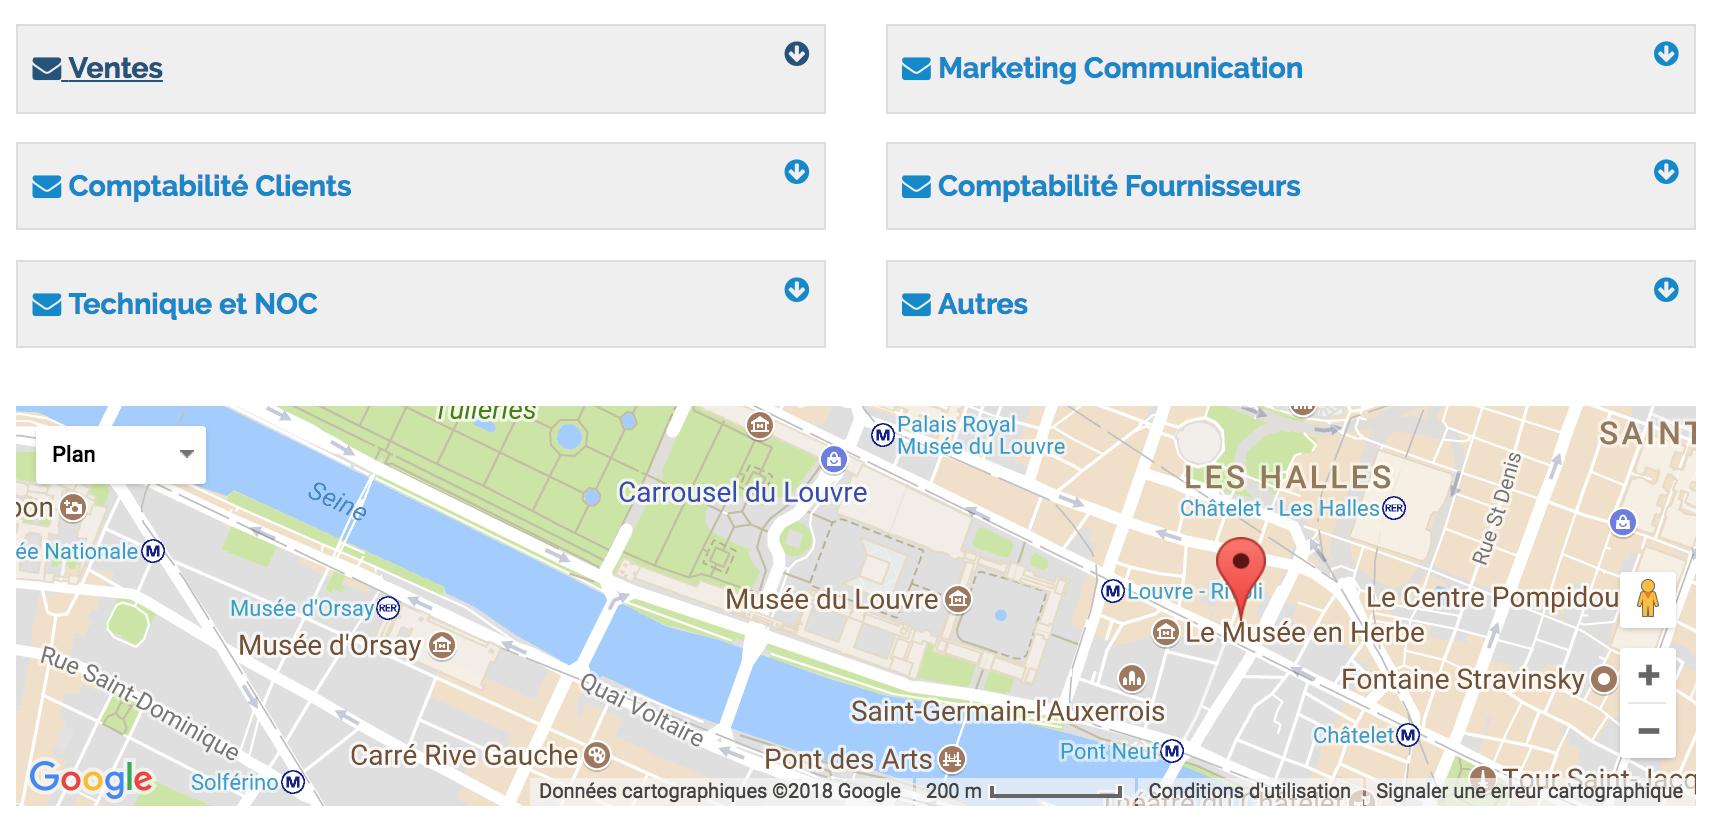 Formulaire contact service vente, service compta, Technique, marketing,